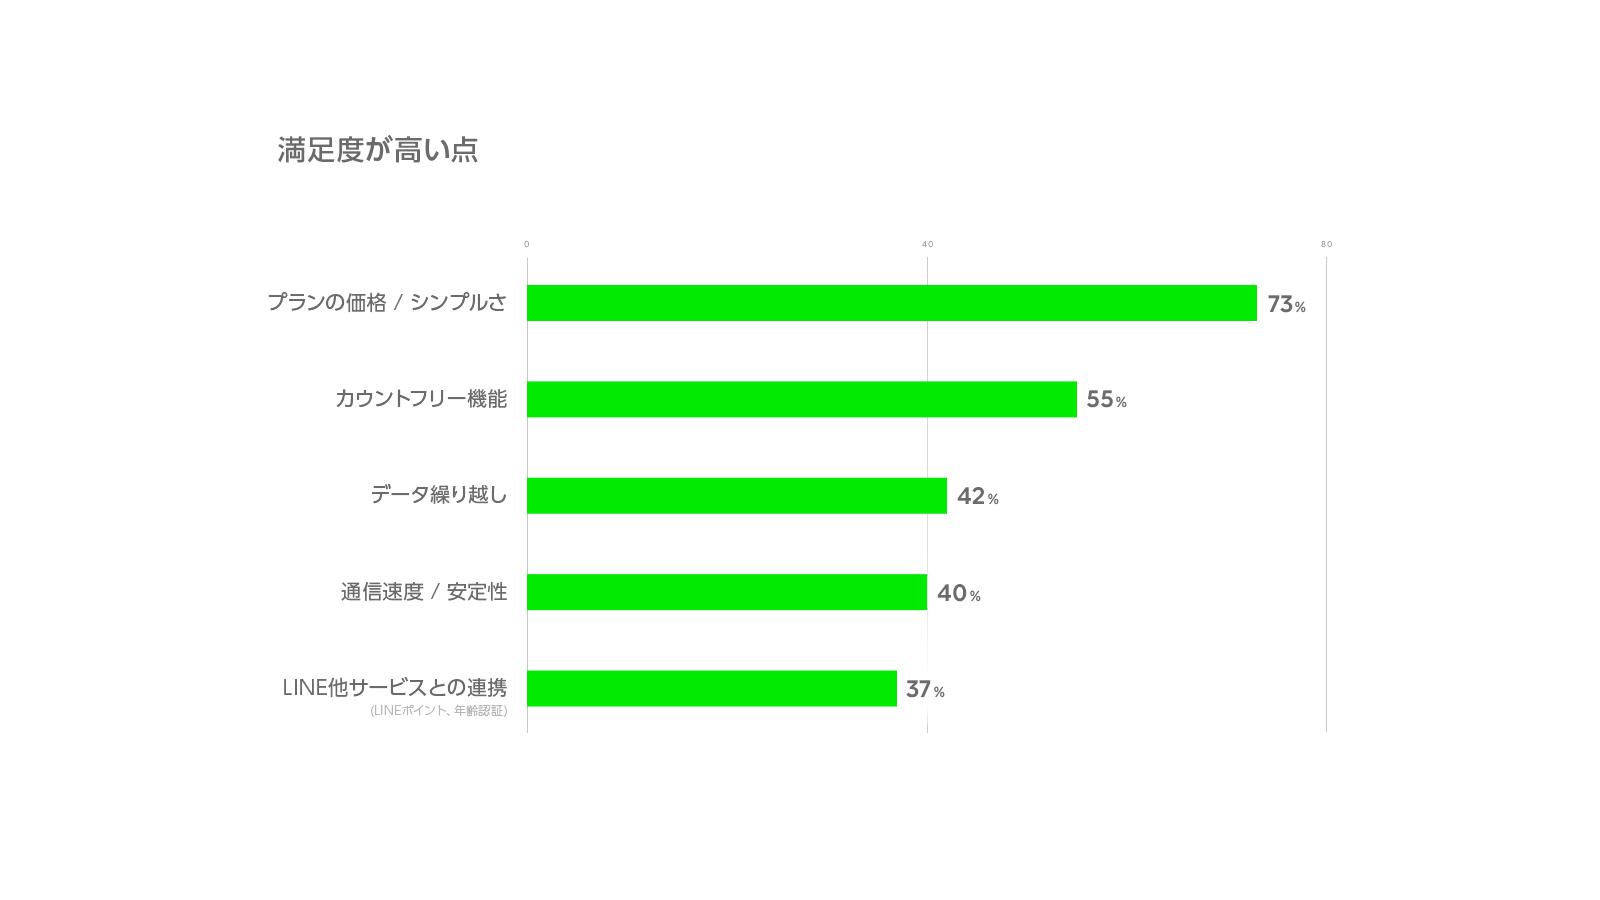 /stf/linecorp/ja/pr/LINEmobile_image_05.png